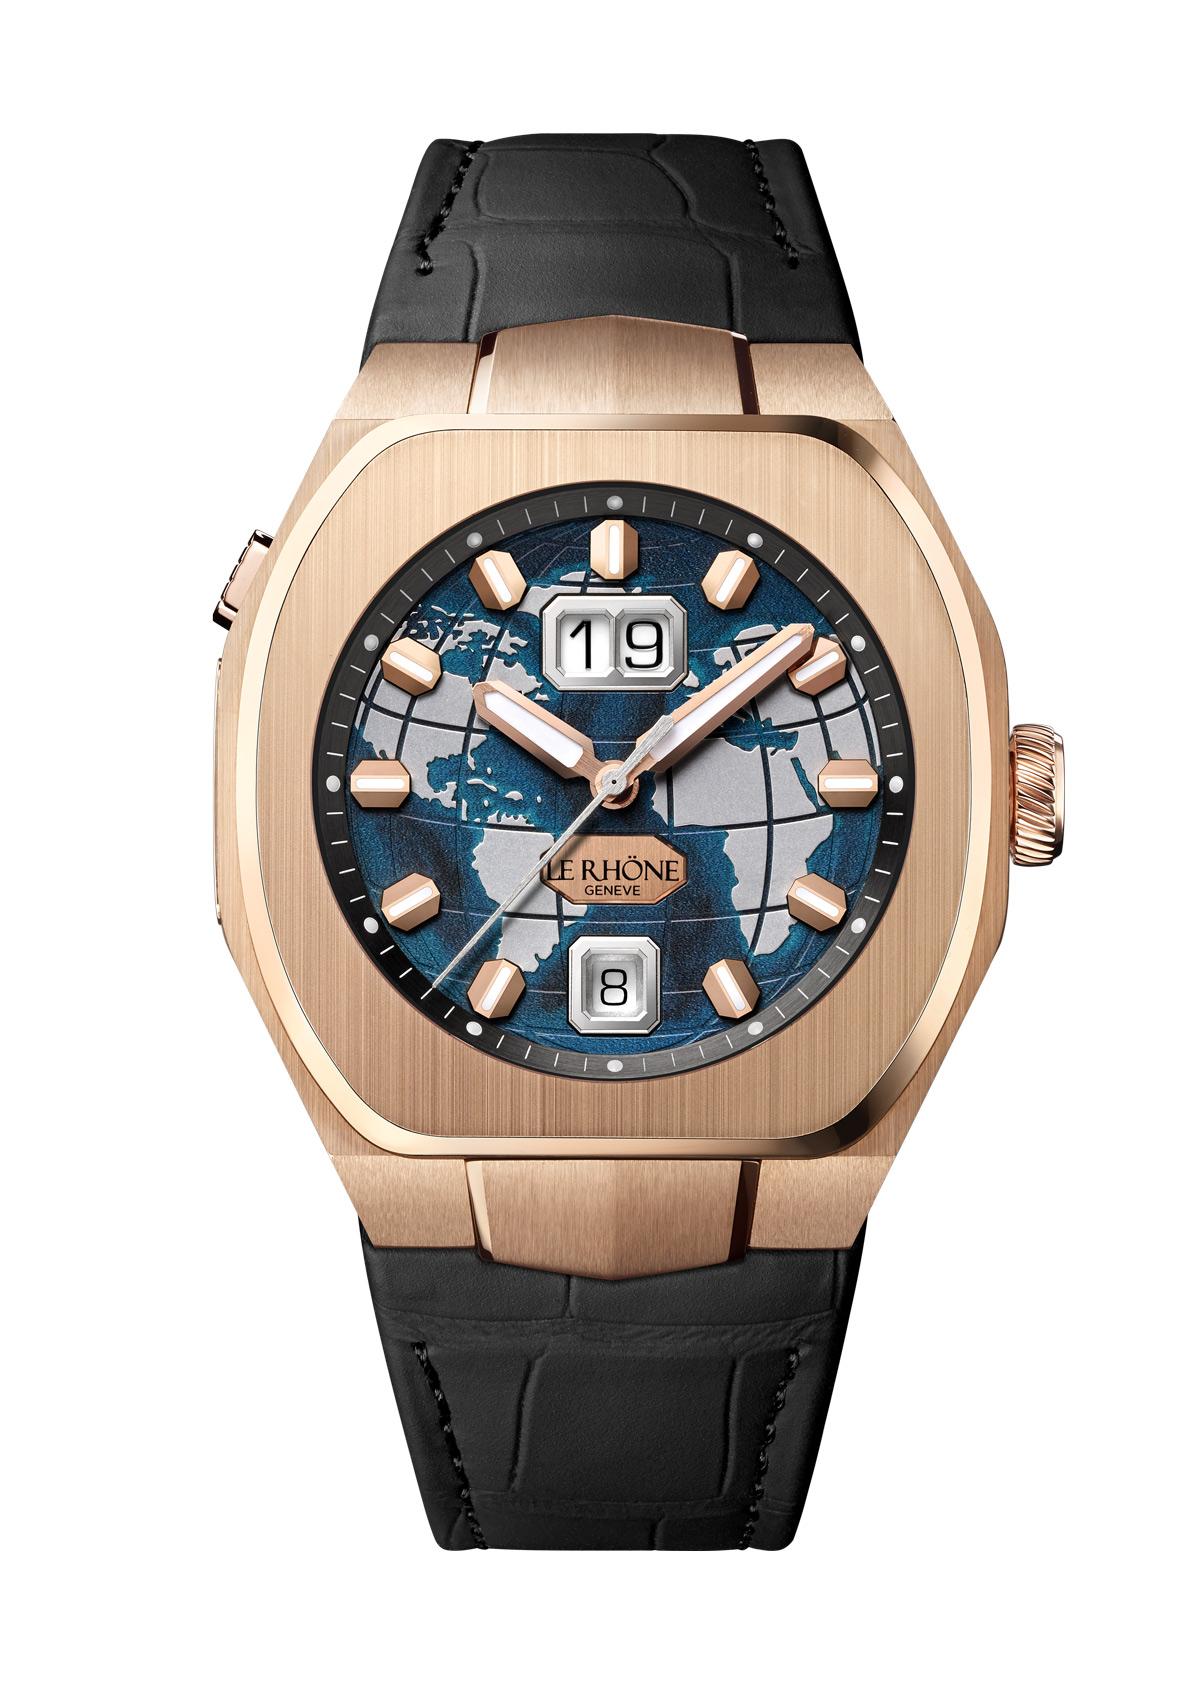 voyager-le-rhone-watch-H6PG052-1-A99D